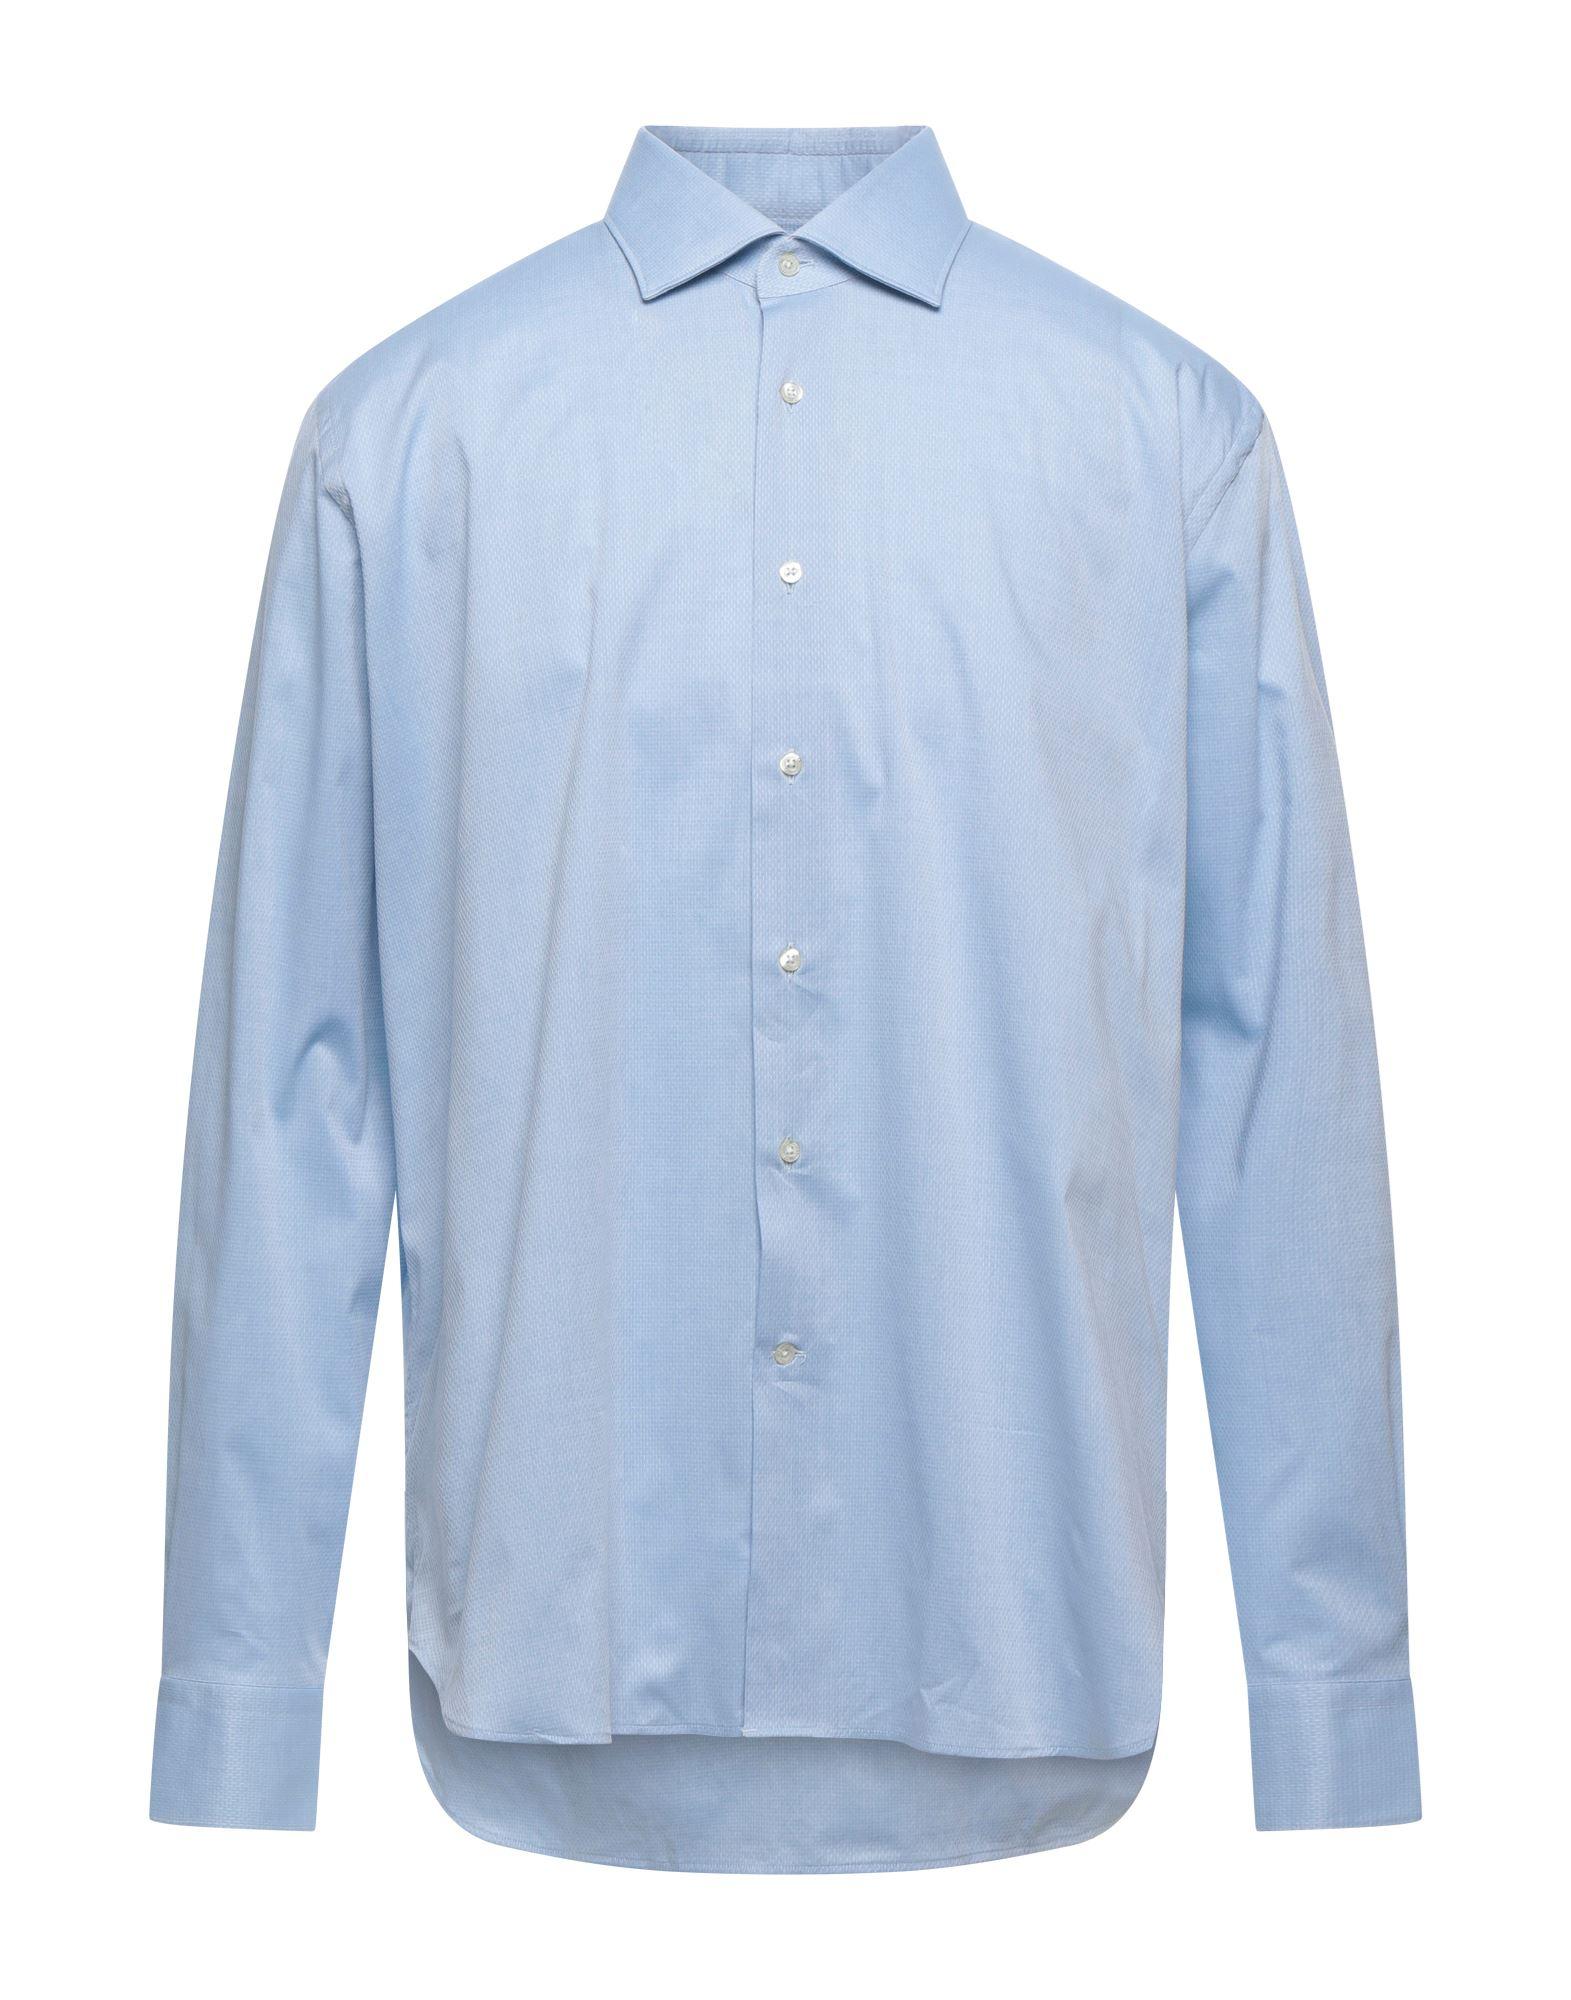 Trussardi Collection Shirts SHIRTS